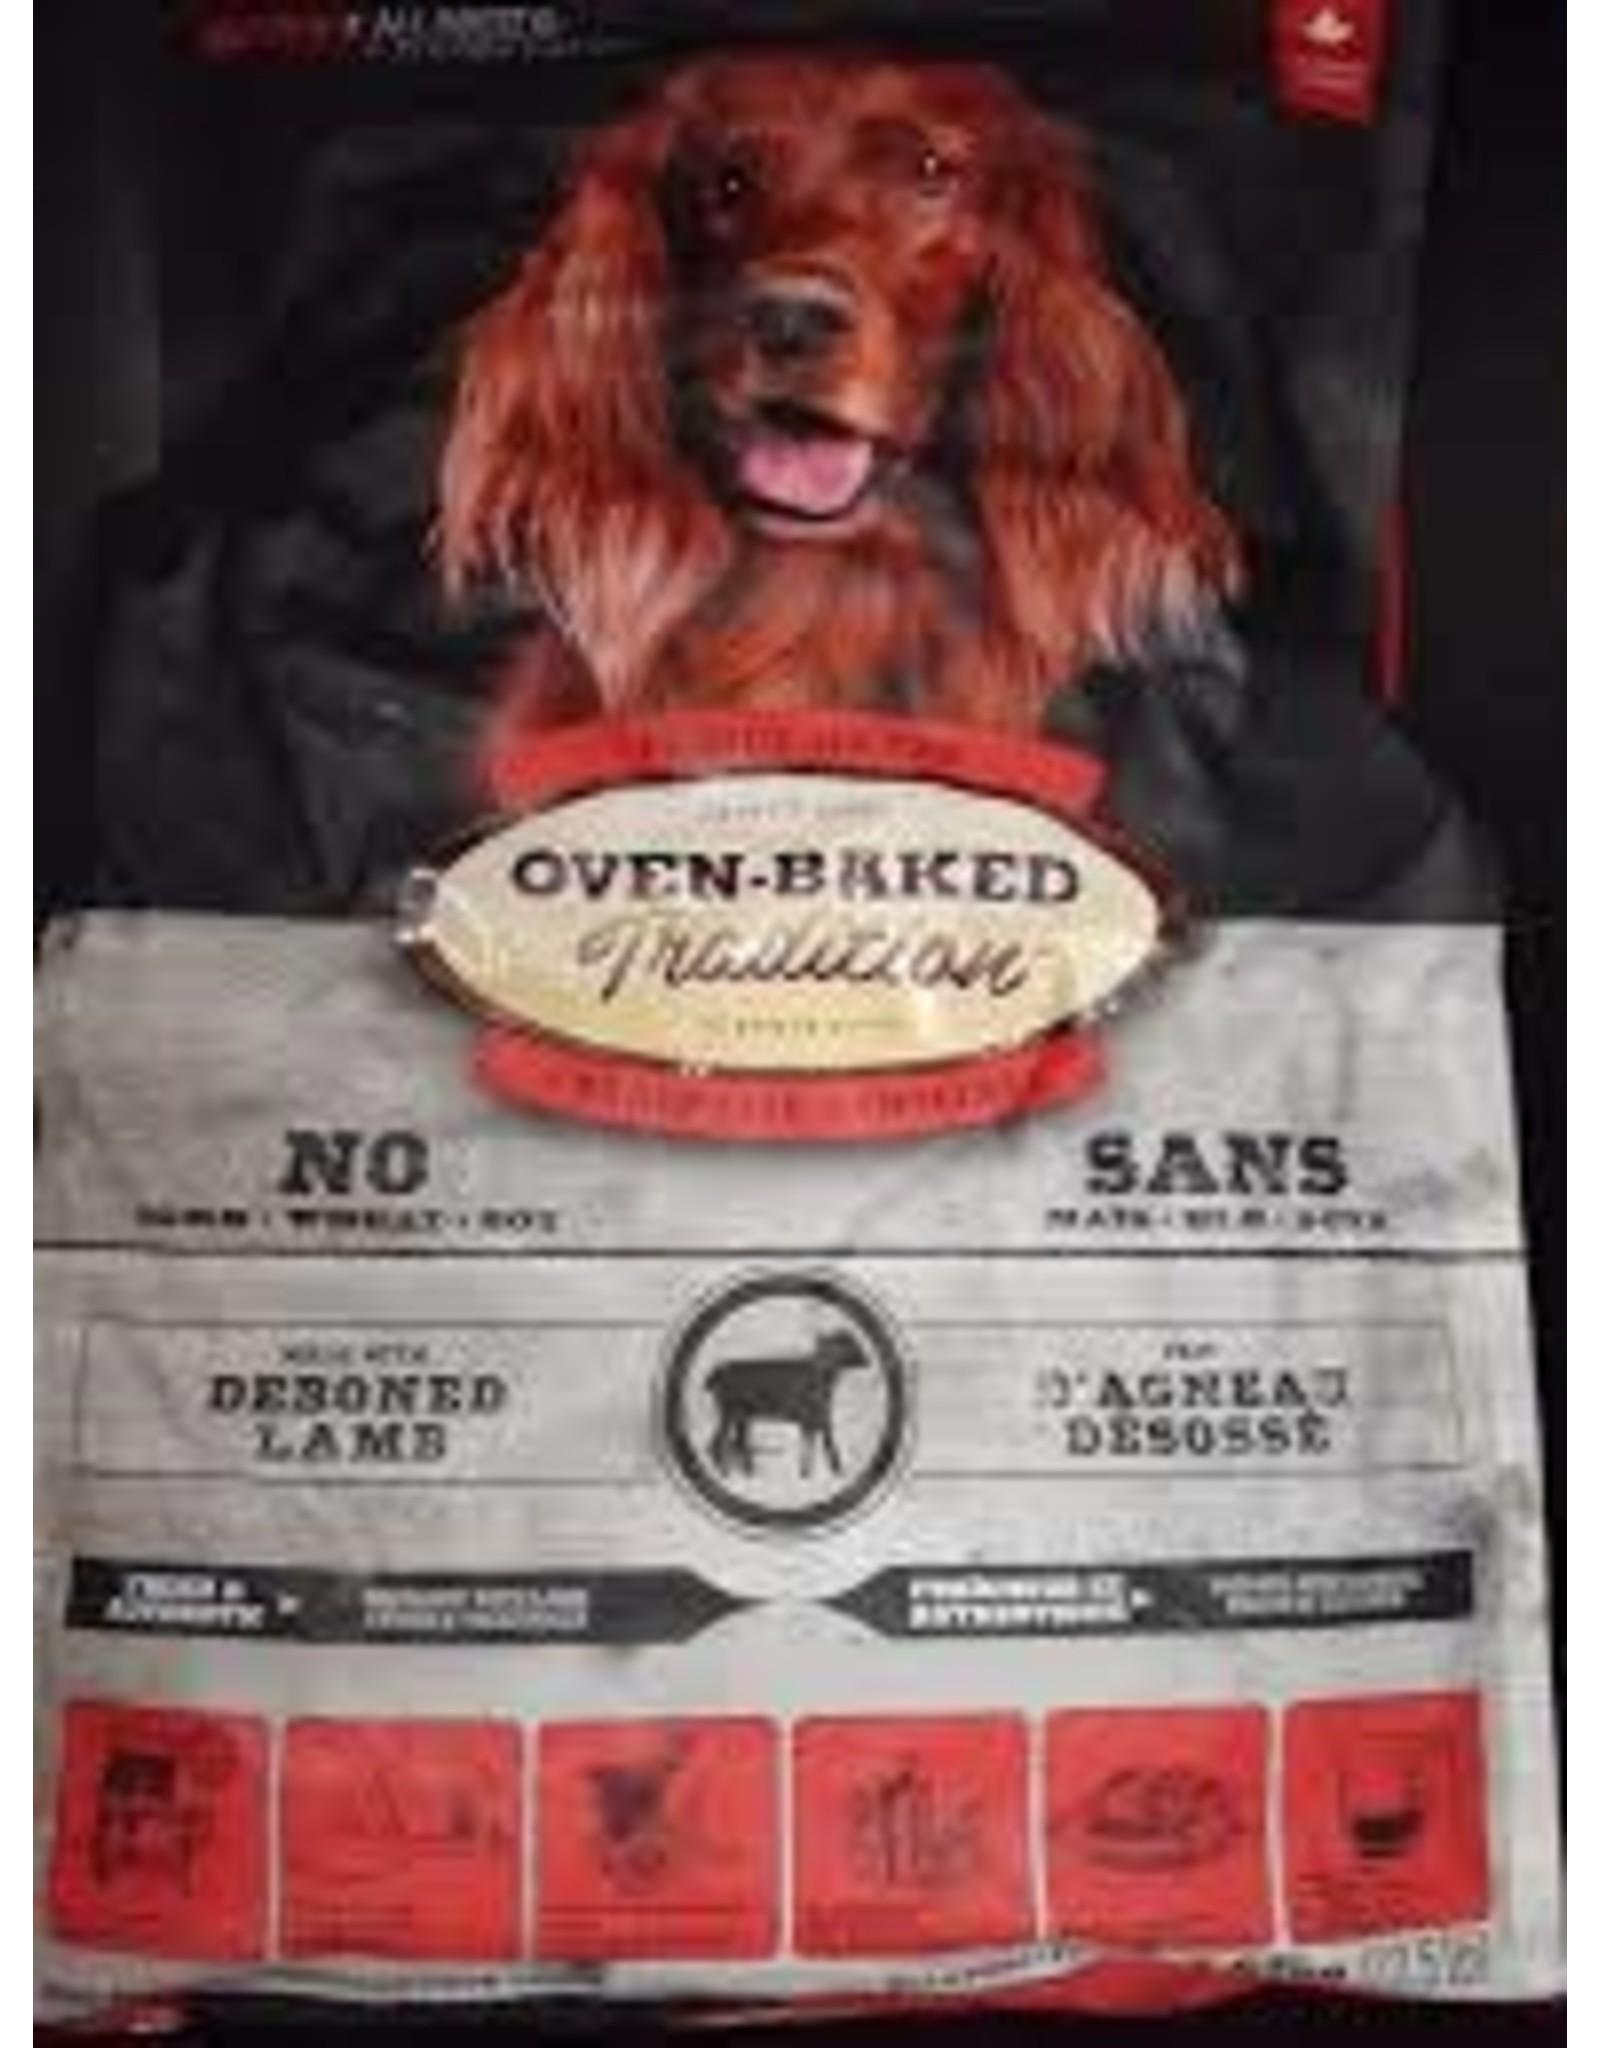 Oven-Baked Tradition Oven-Baked Tradition  Lamb Dog